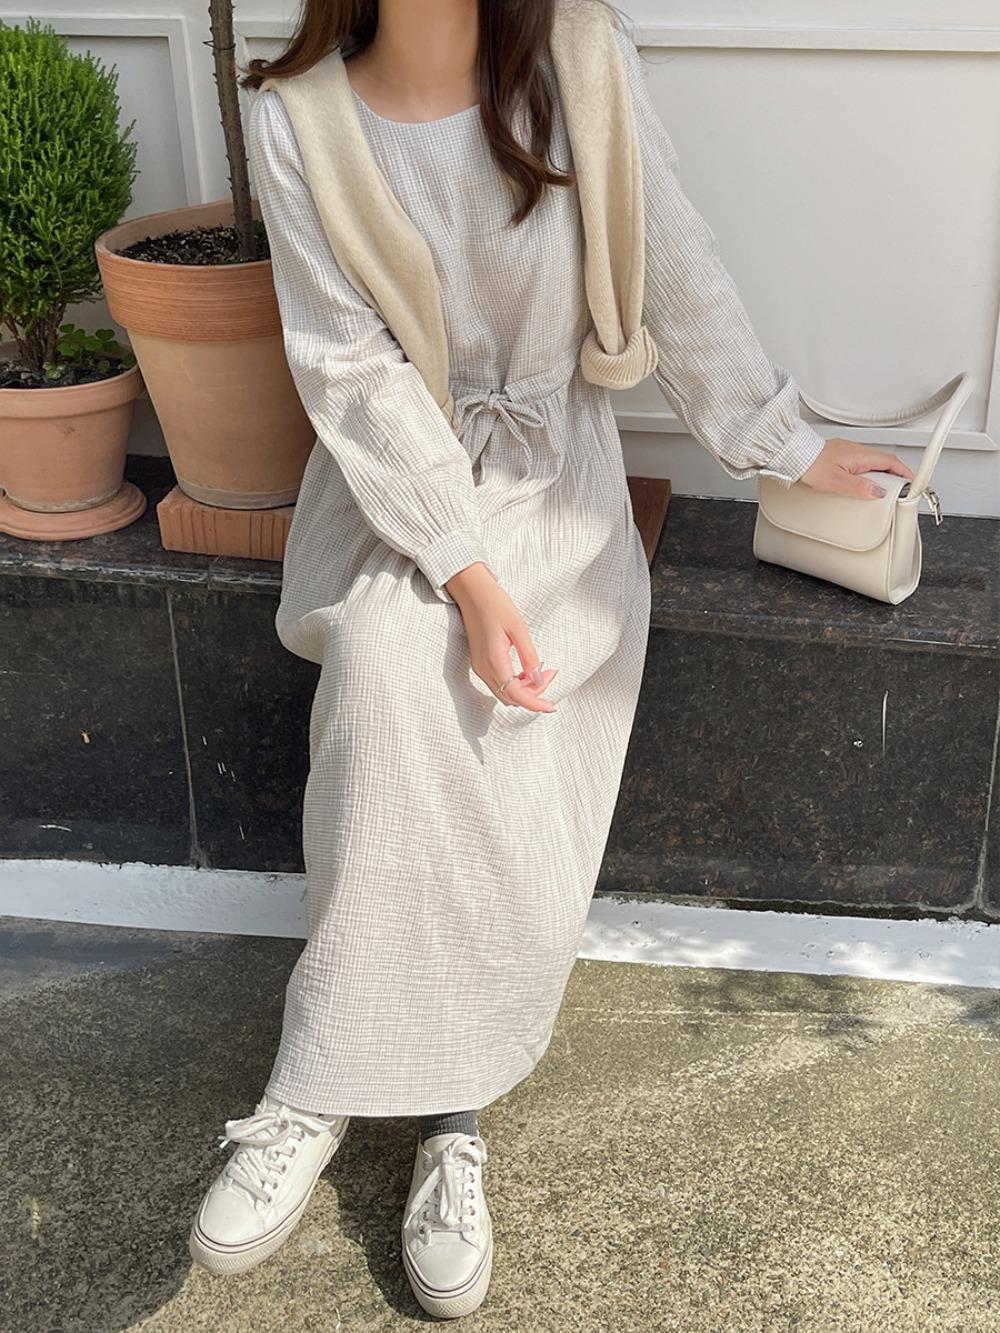 k-club-[자체제작]휴즈 체크 스트링 원피스♡韓國女裝連身裙